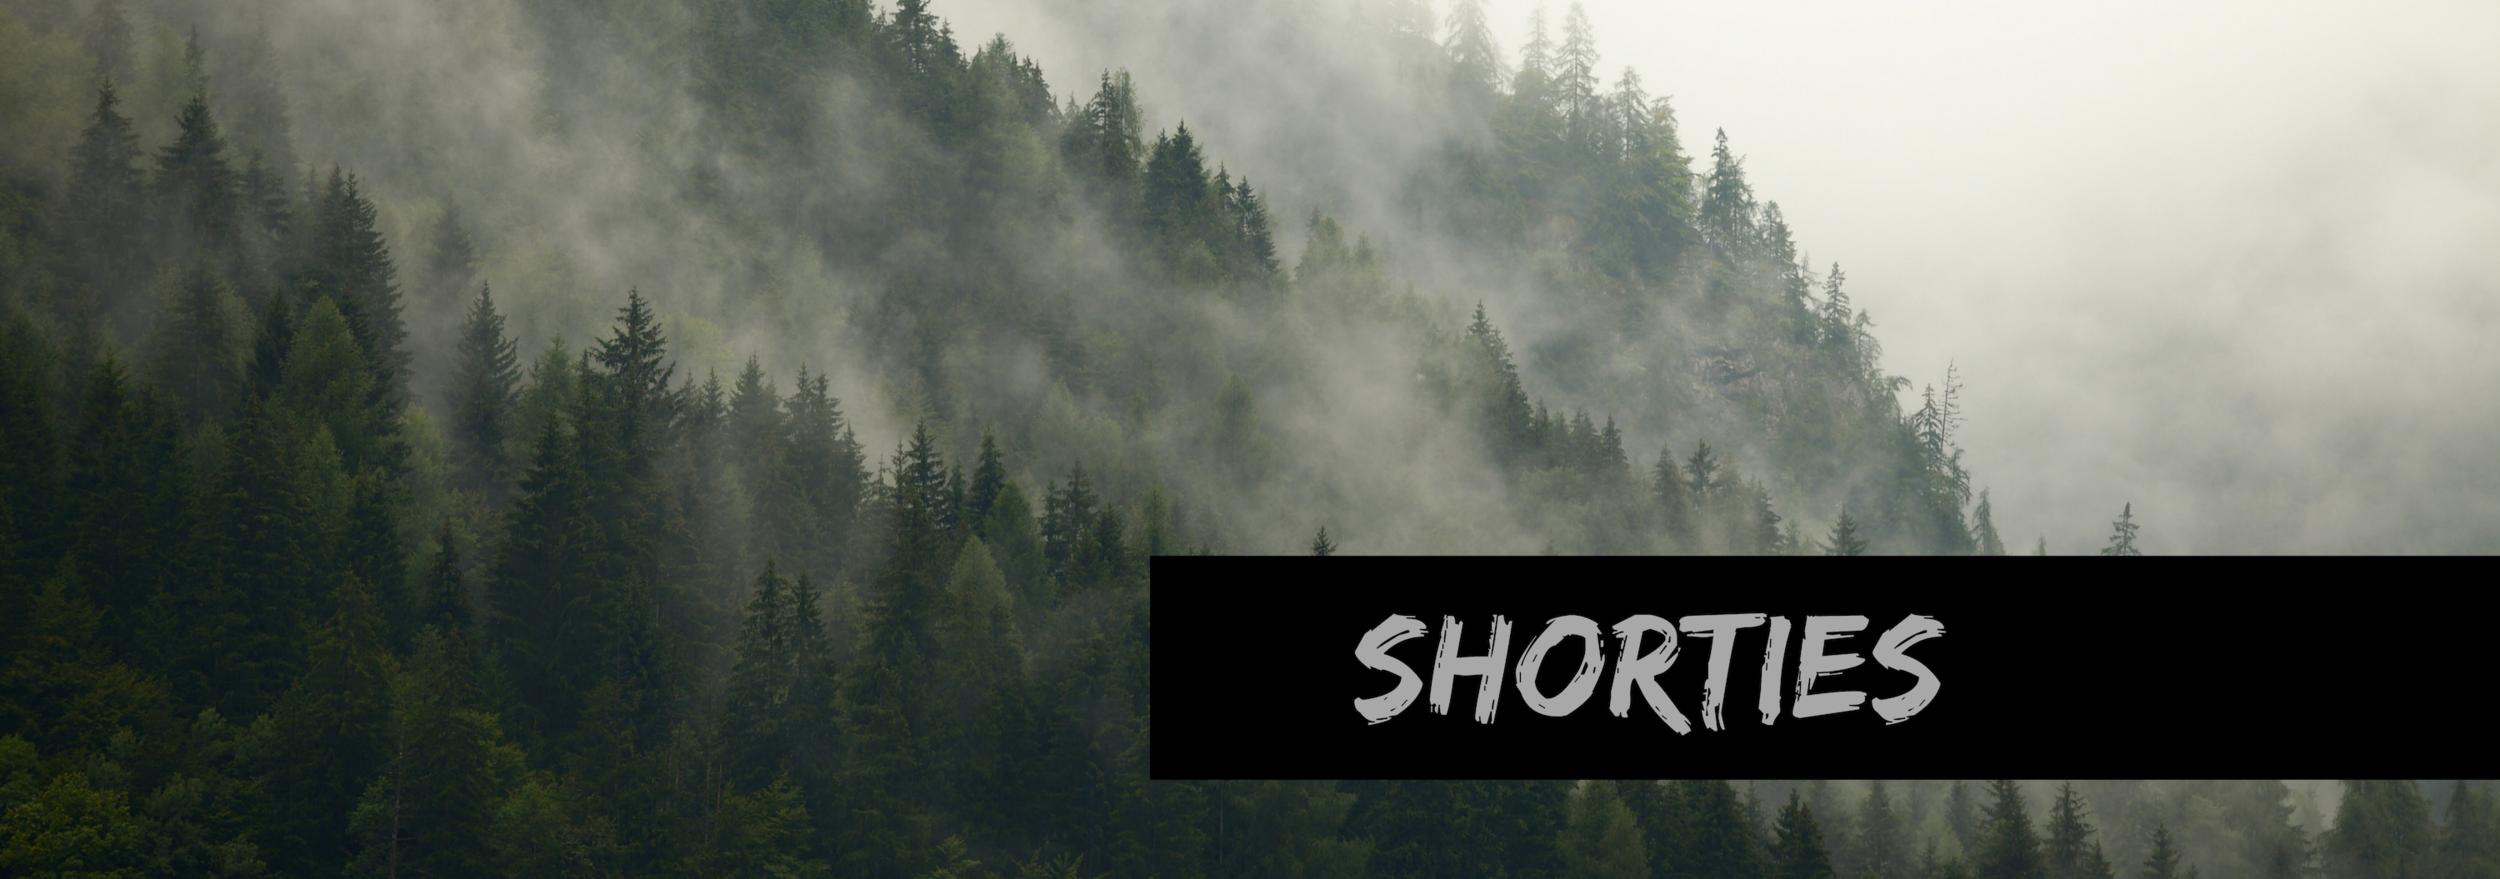 shorties-by-emma-isaac.png